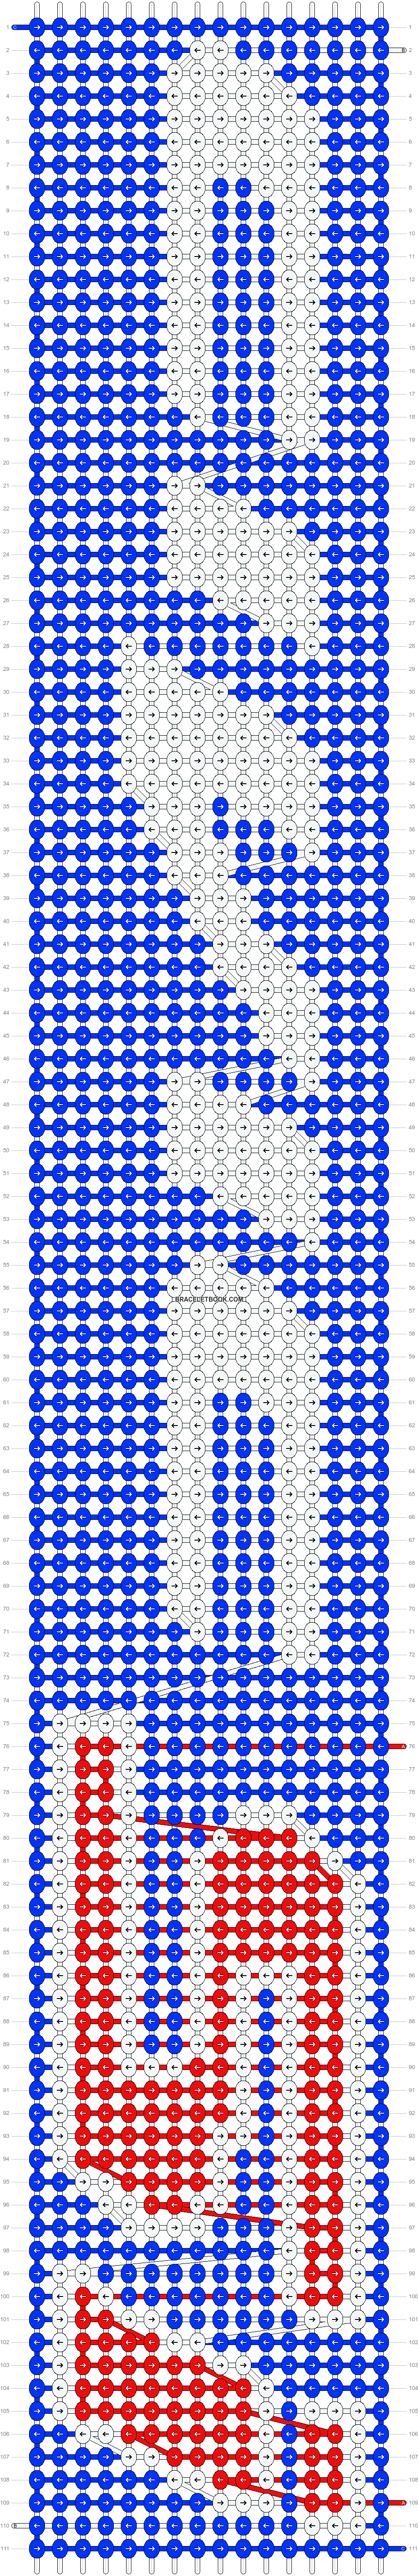 Alpha pattern #27650 pattern